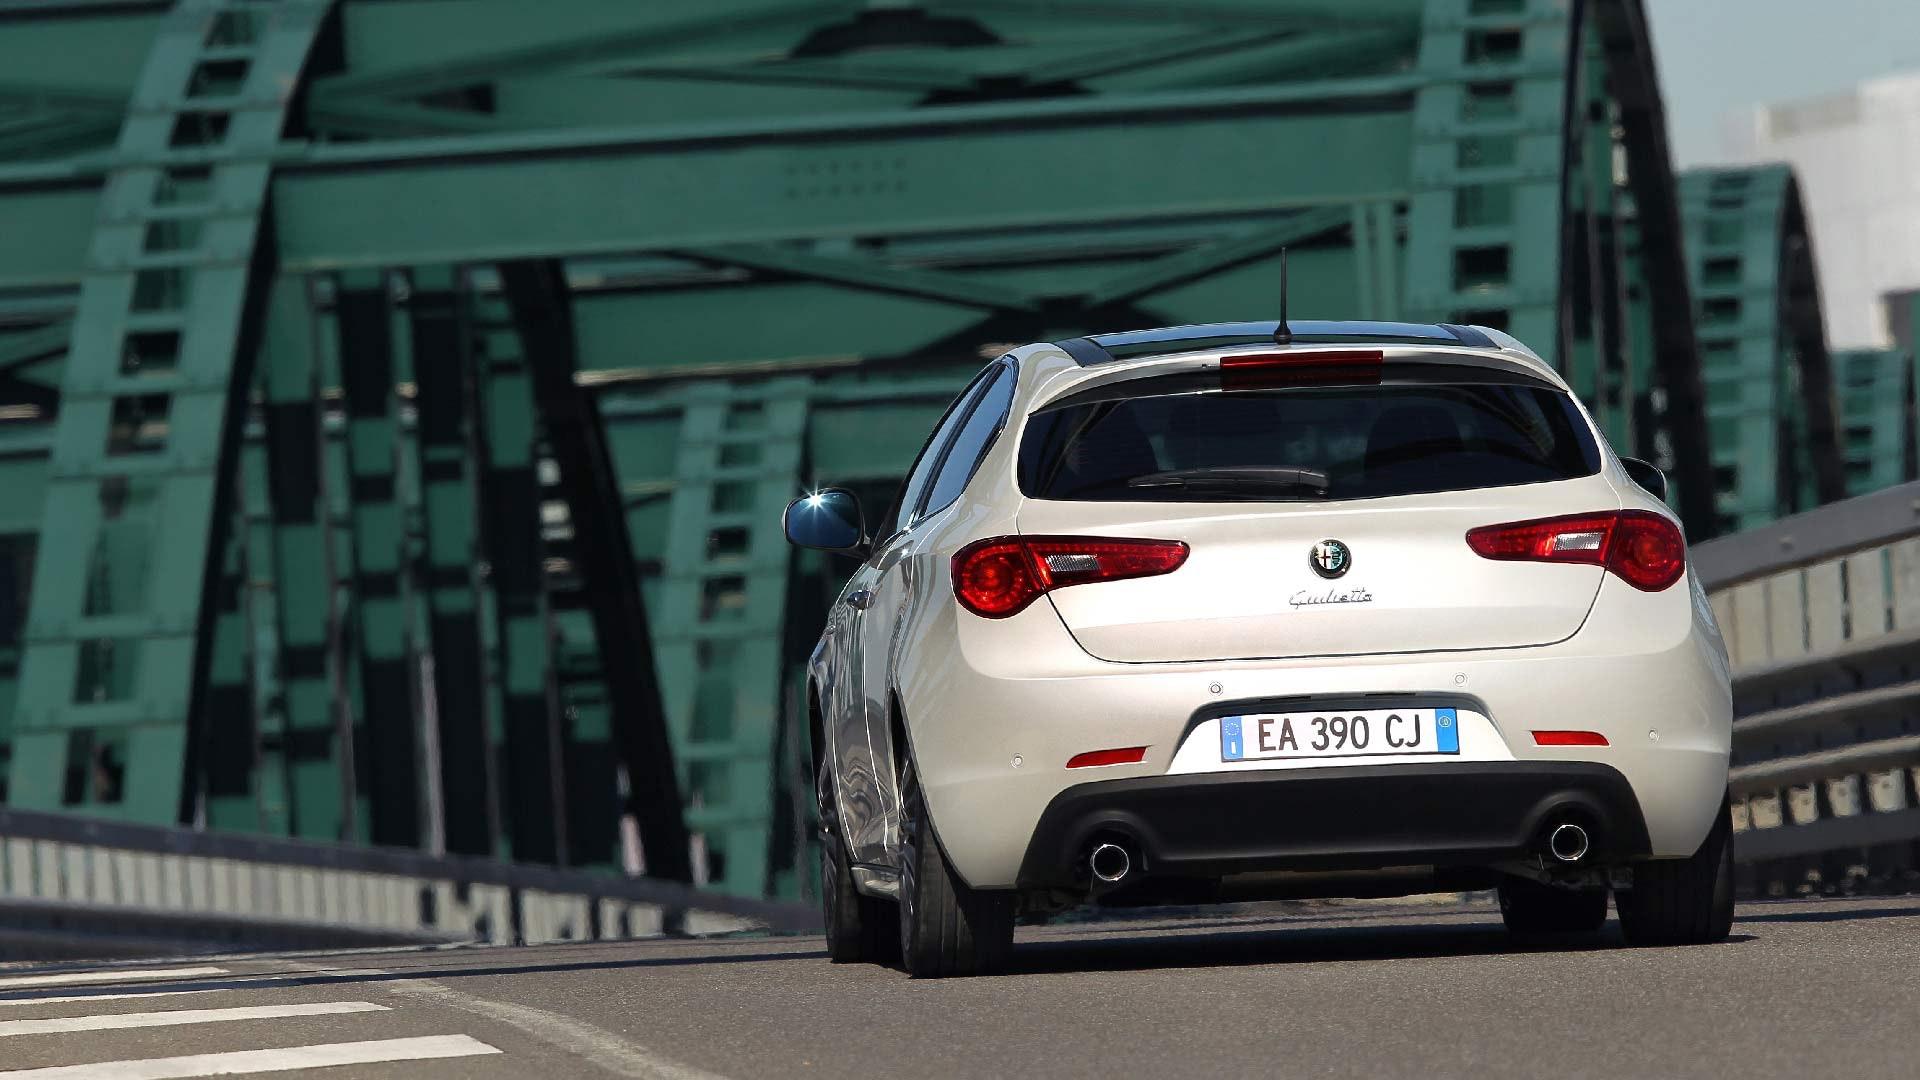 Alfa Romeo Giulietta hvid bagende